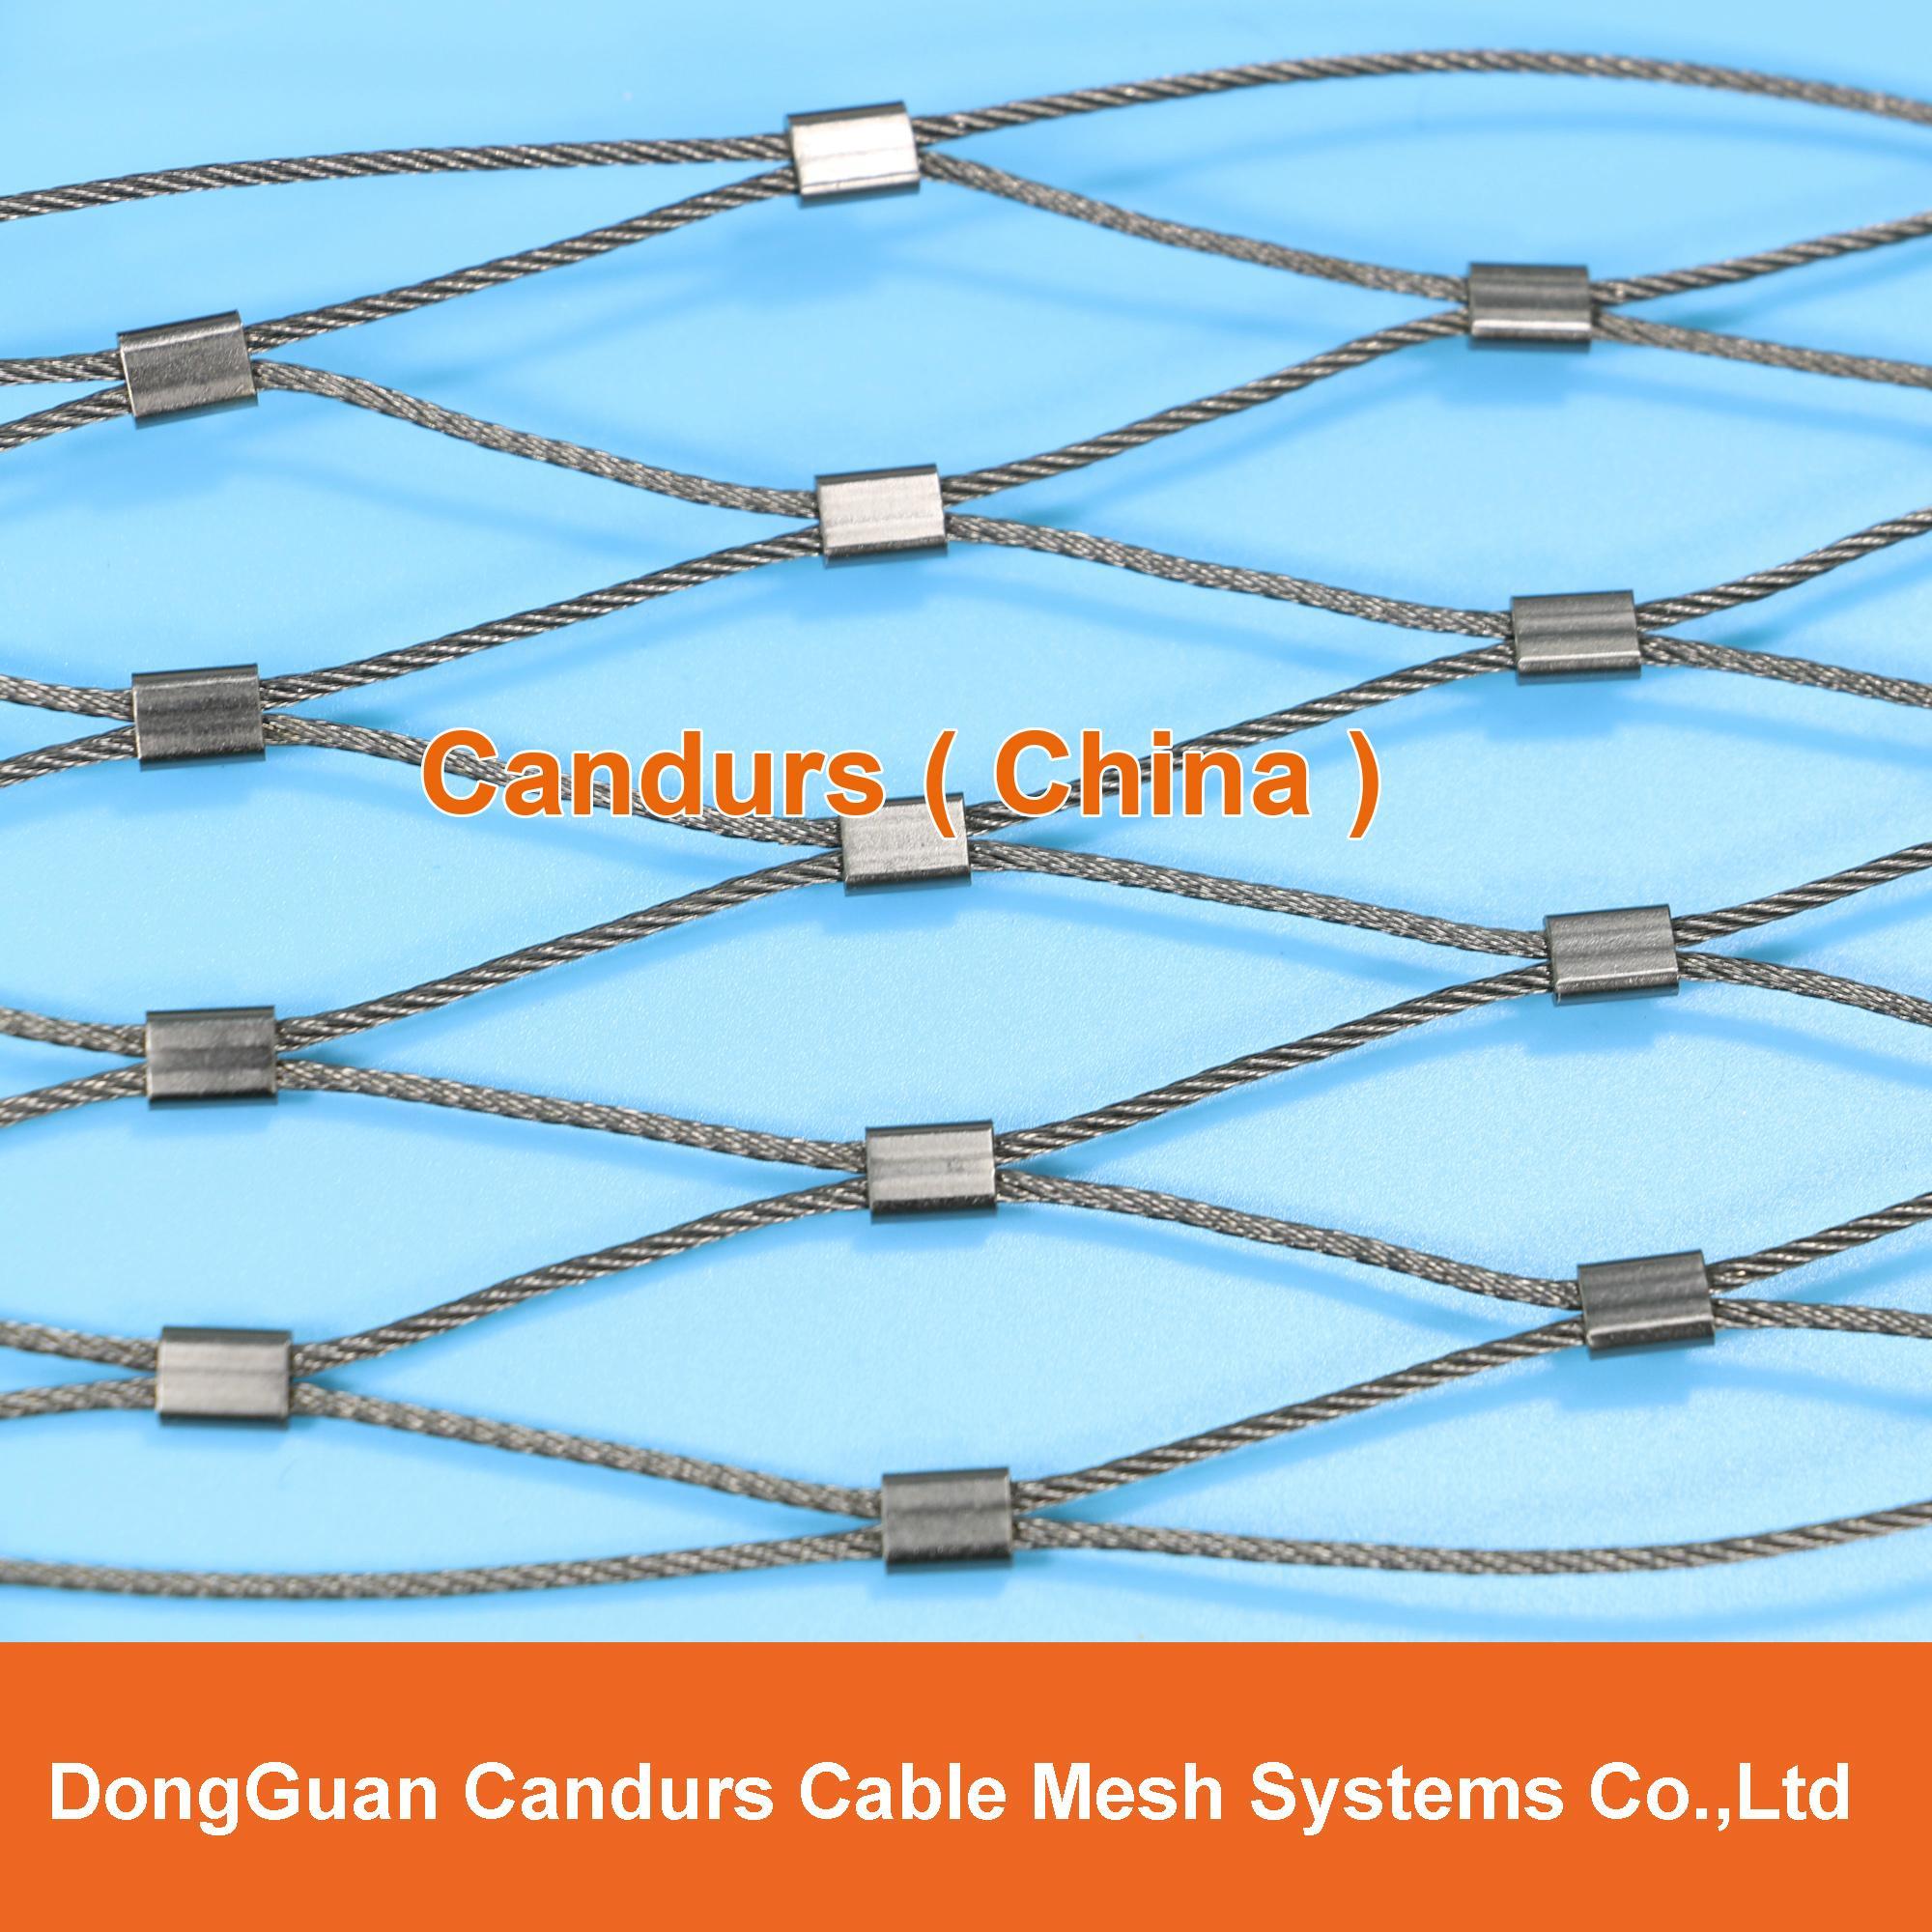 Decorative Garden Wire Fence Panels - DecorRope - Candurs (China ...